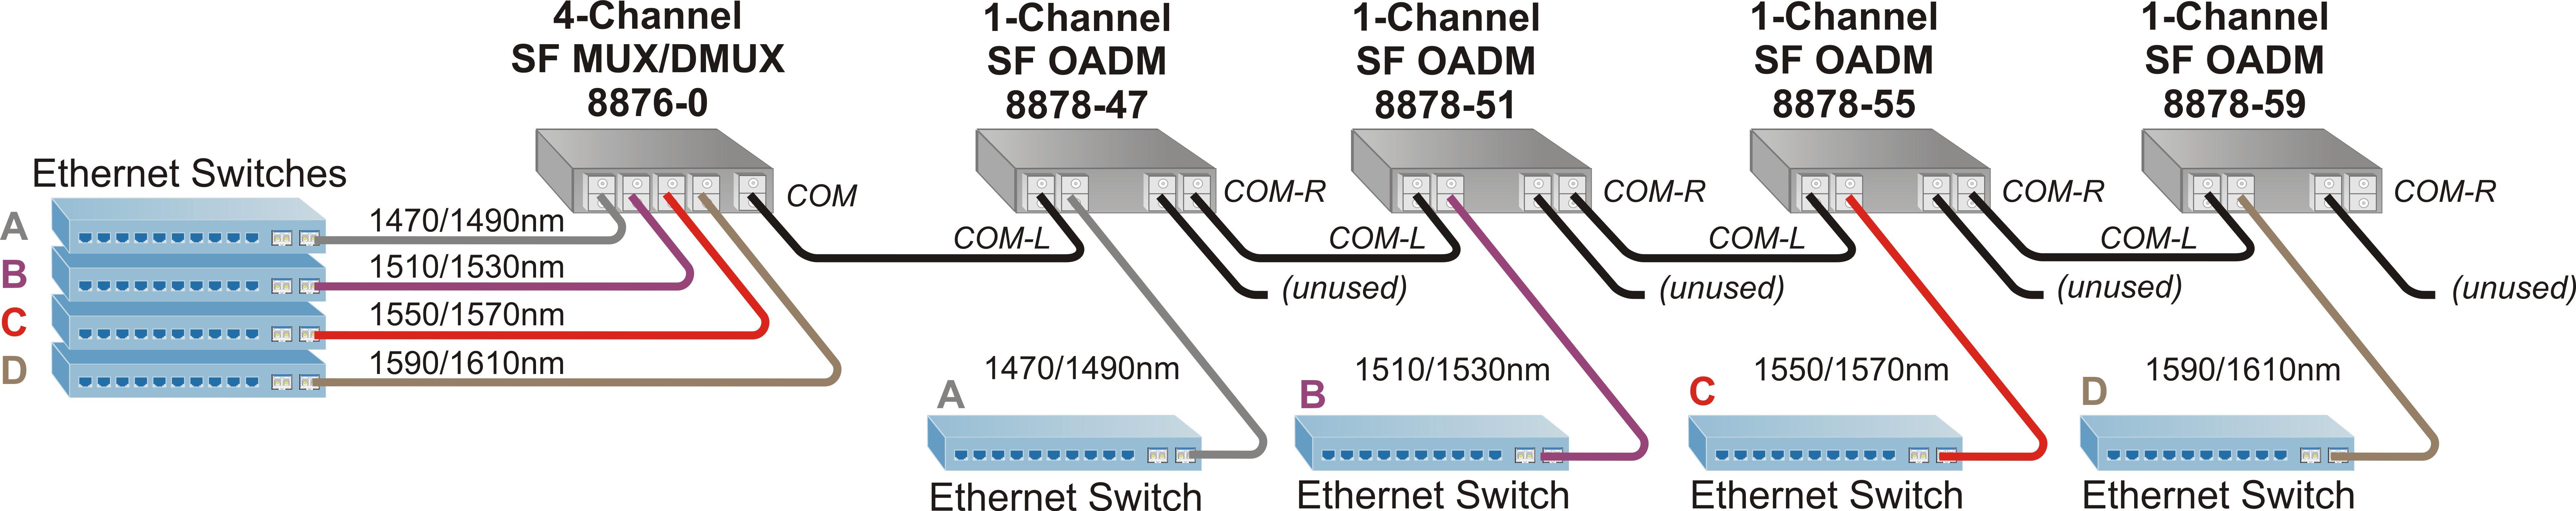 Single Fiber CWDM Multiplexer | Single Fiber CWDM MUX and